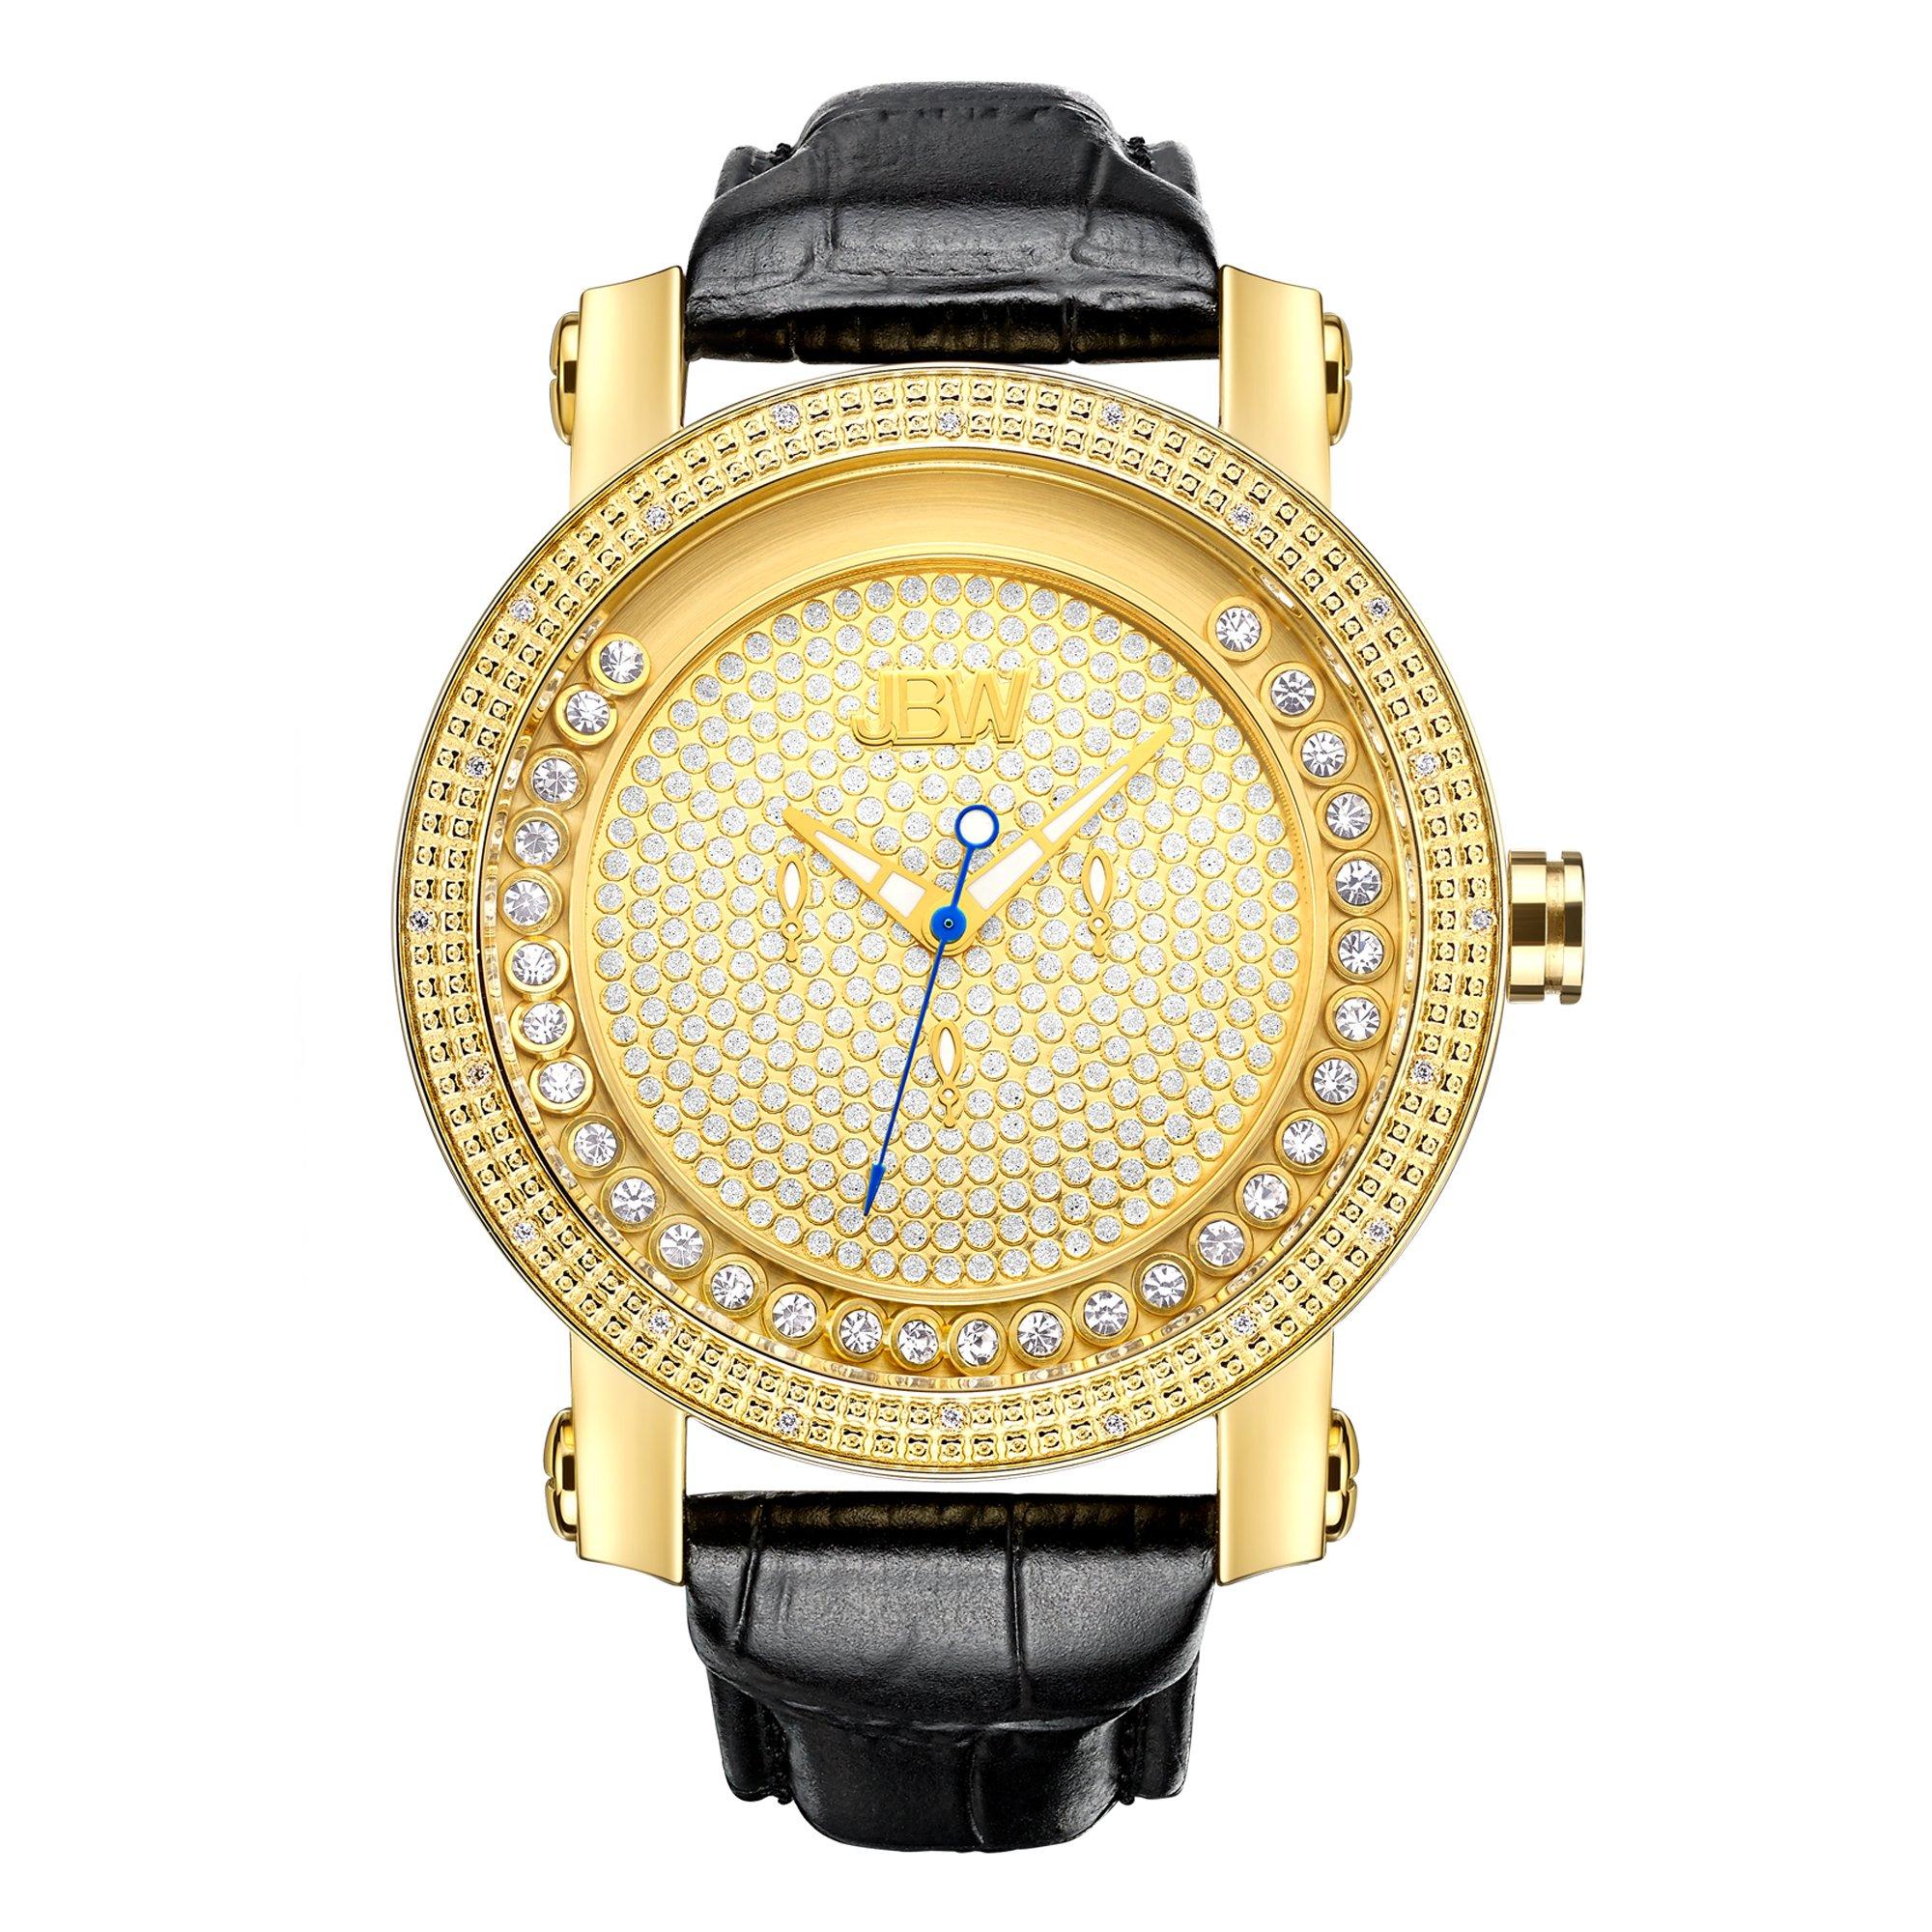 "Jbw Men's Jb-6211L-A ""Hendrix"" Gold-Tone Multi-Function Leather Diamond Watch 8"